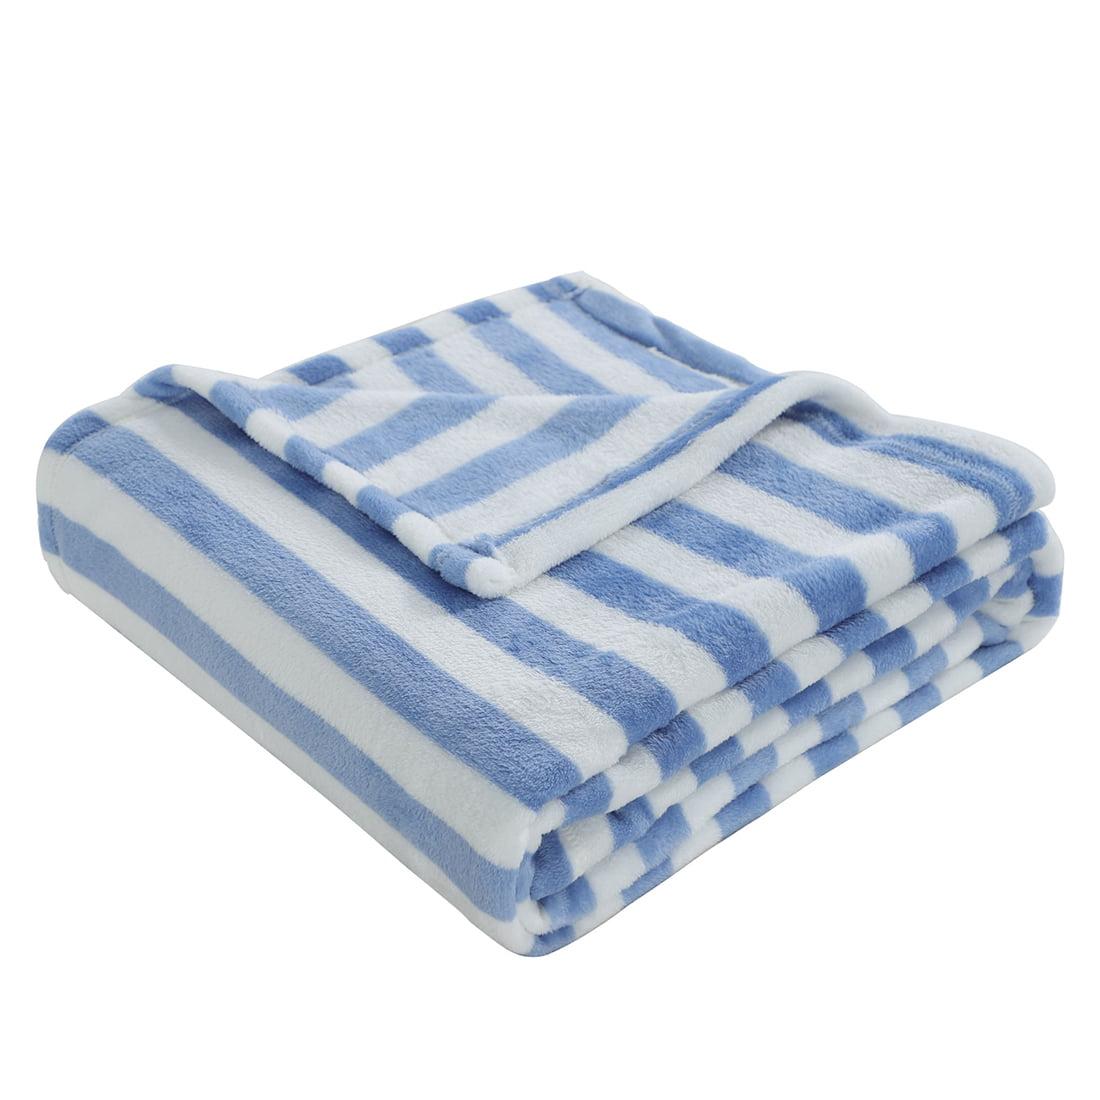 Warm Soft Fleece Throw Blanket Plush Reversible Printed Blanket